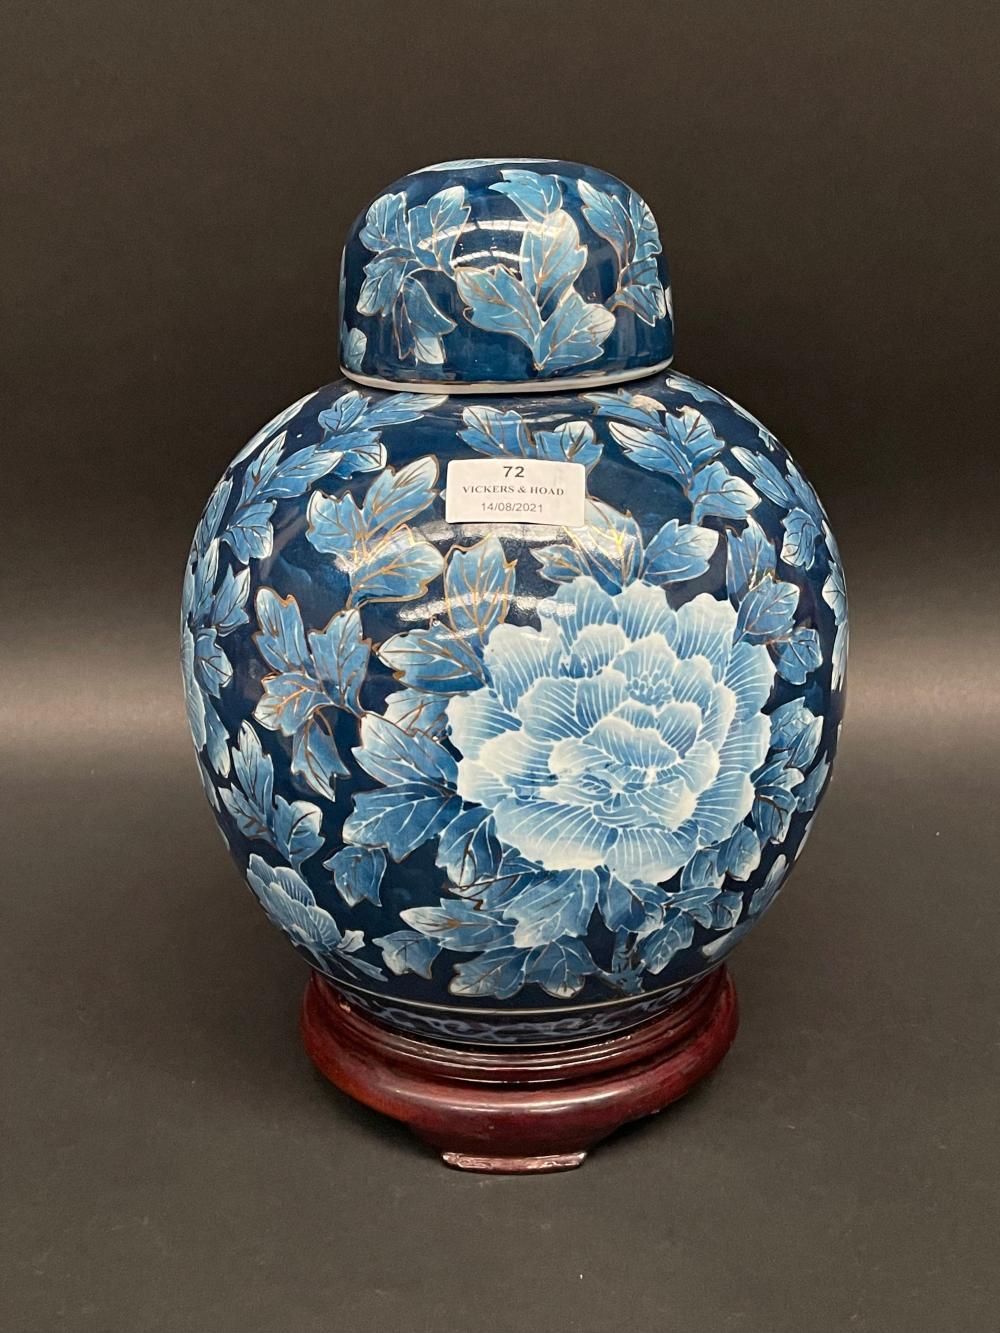 Decorative lidded ginger jar on a wooden base, approx 32cm H